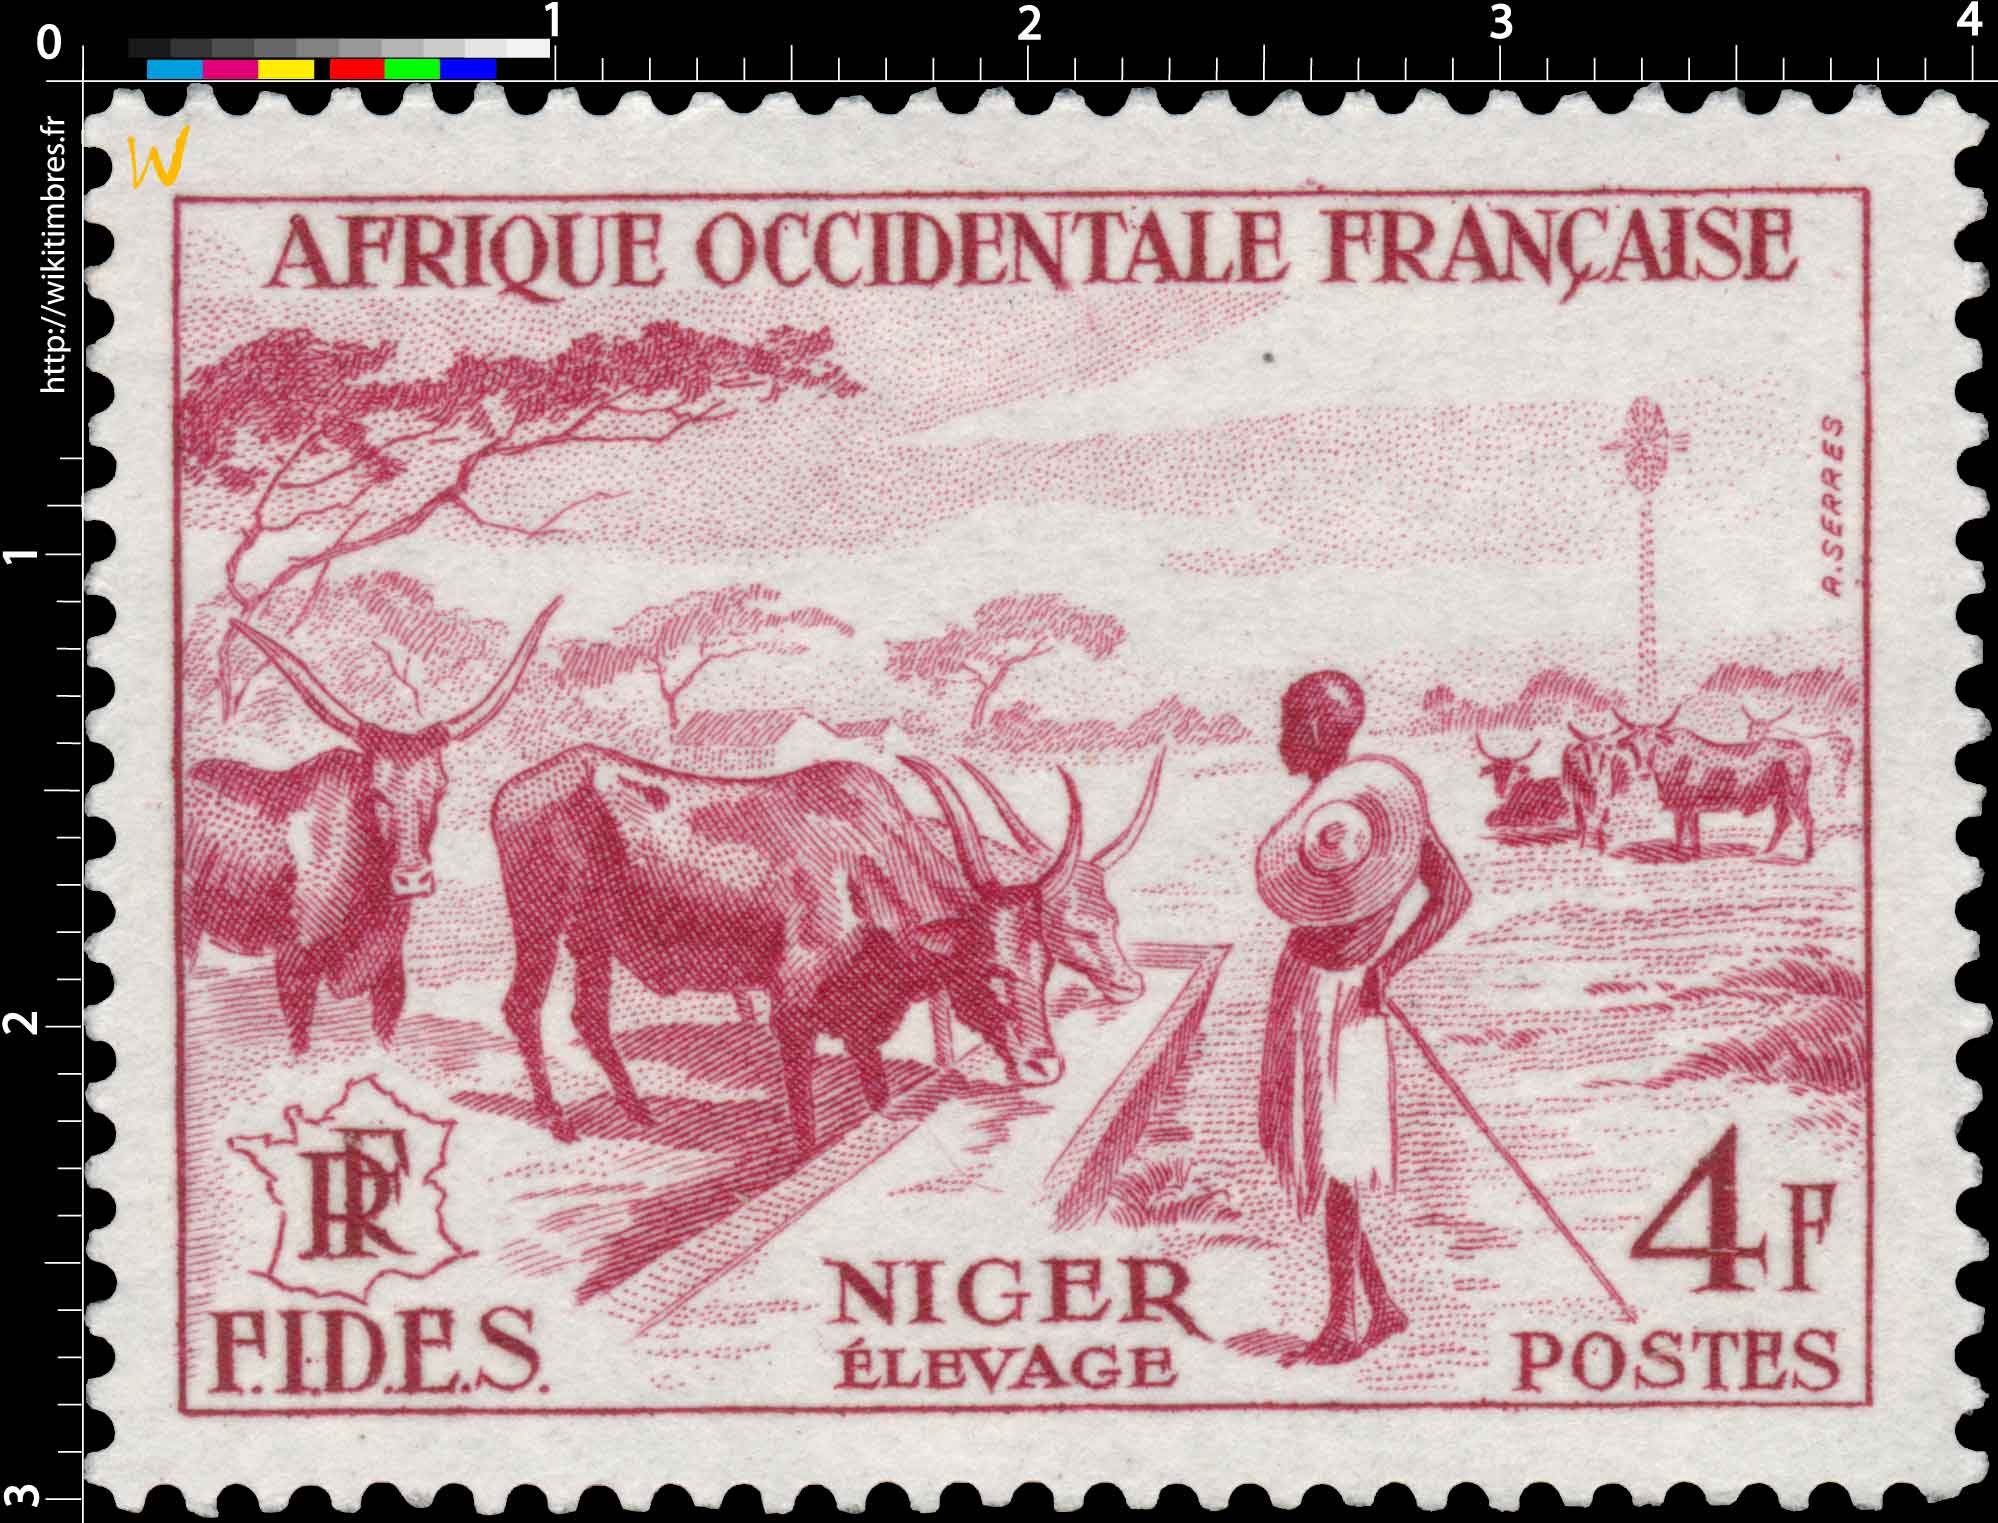 Afrique Occidentale Française - F.I.D.E.S. - Elevage Niger